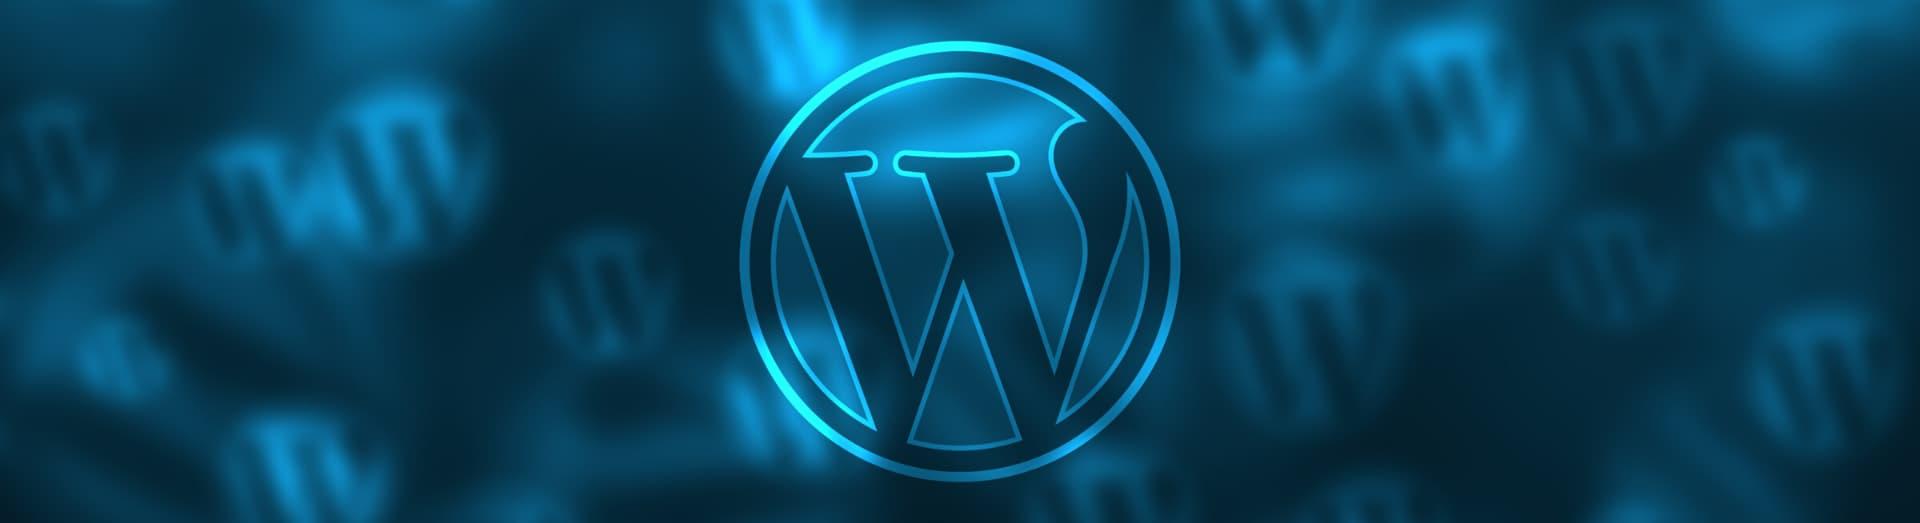 Wordpress + Woocommerce 1